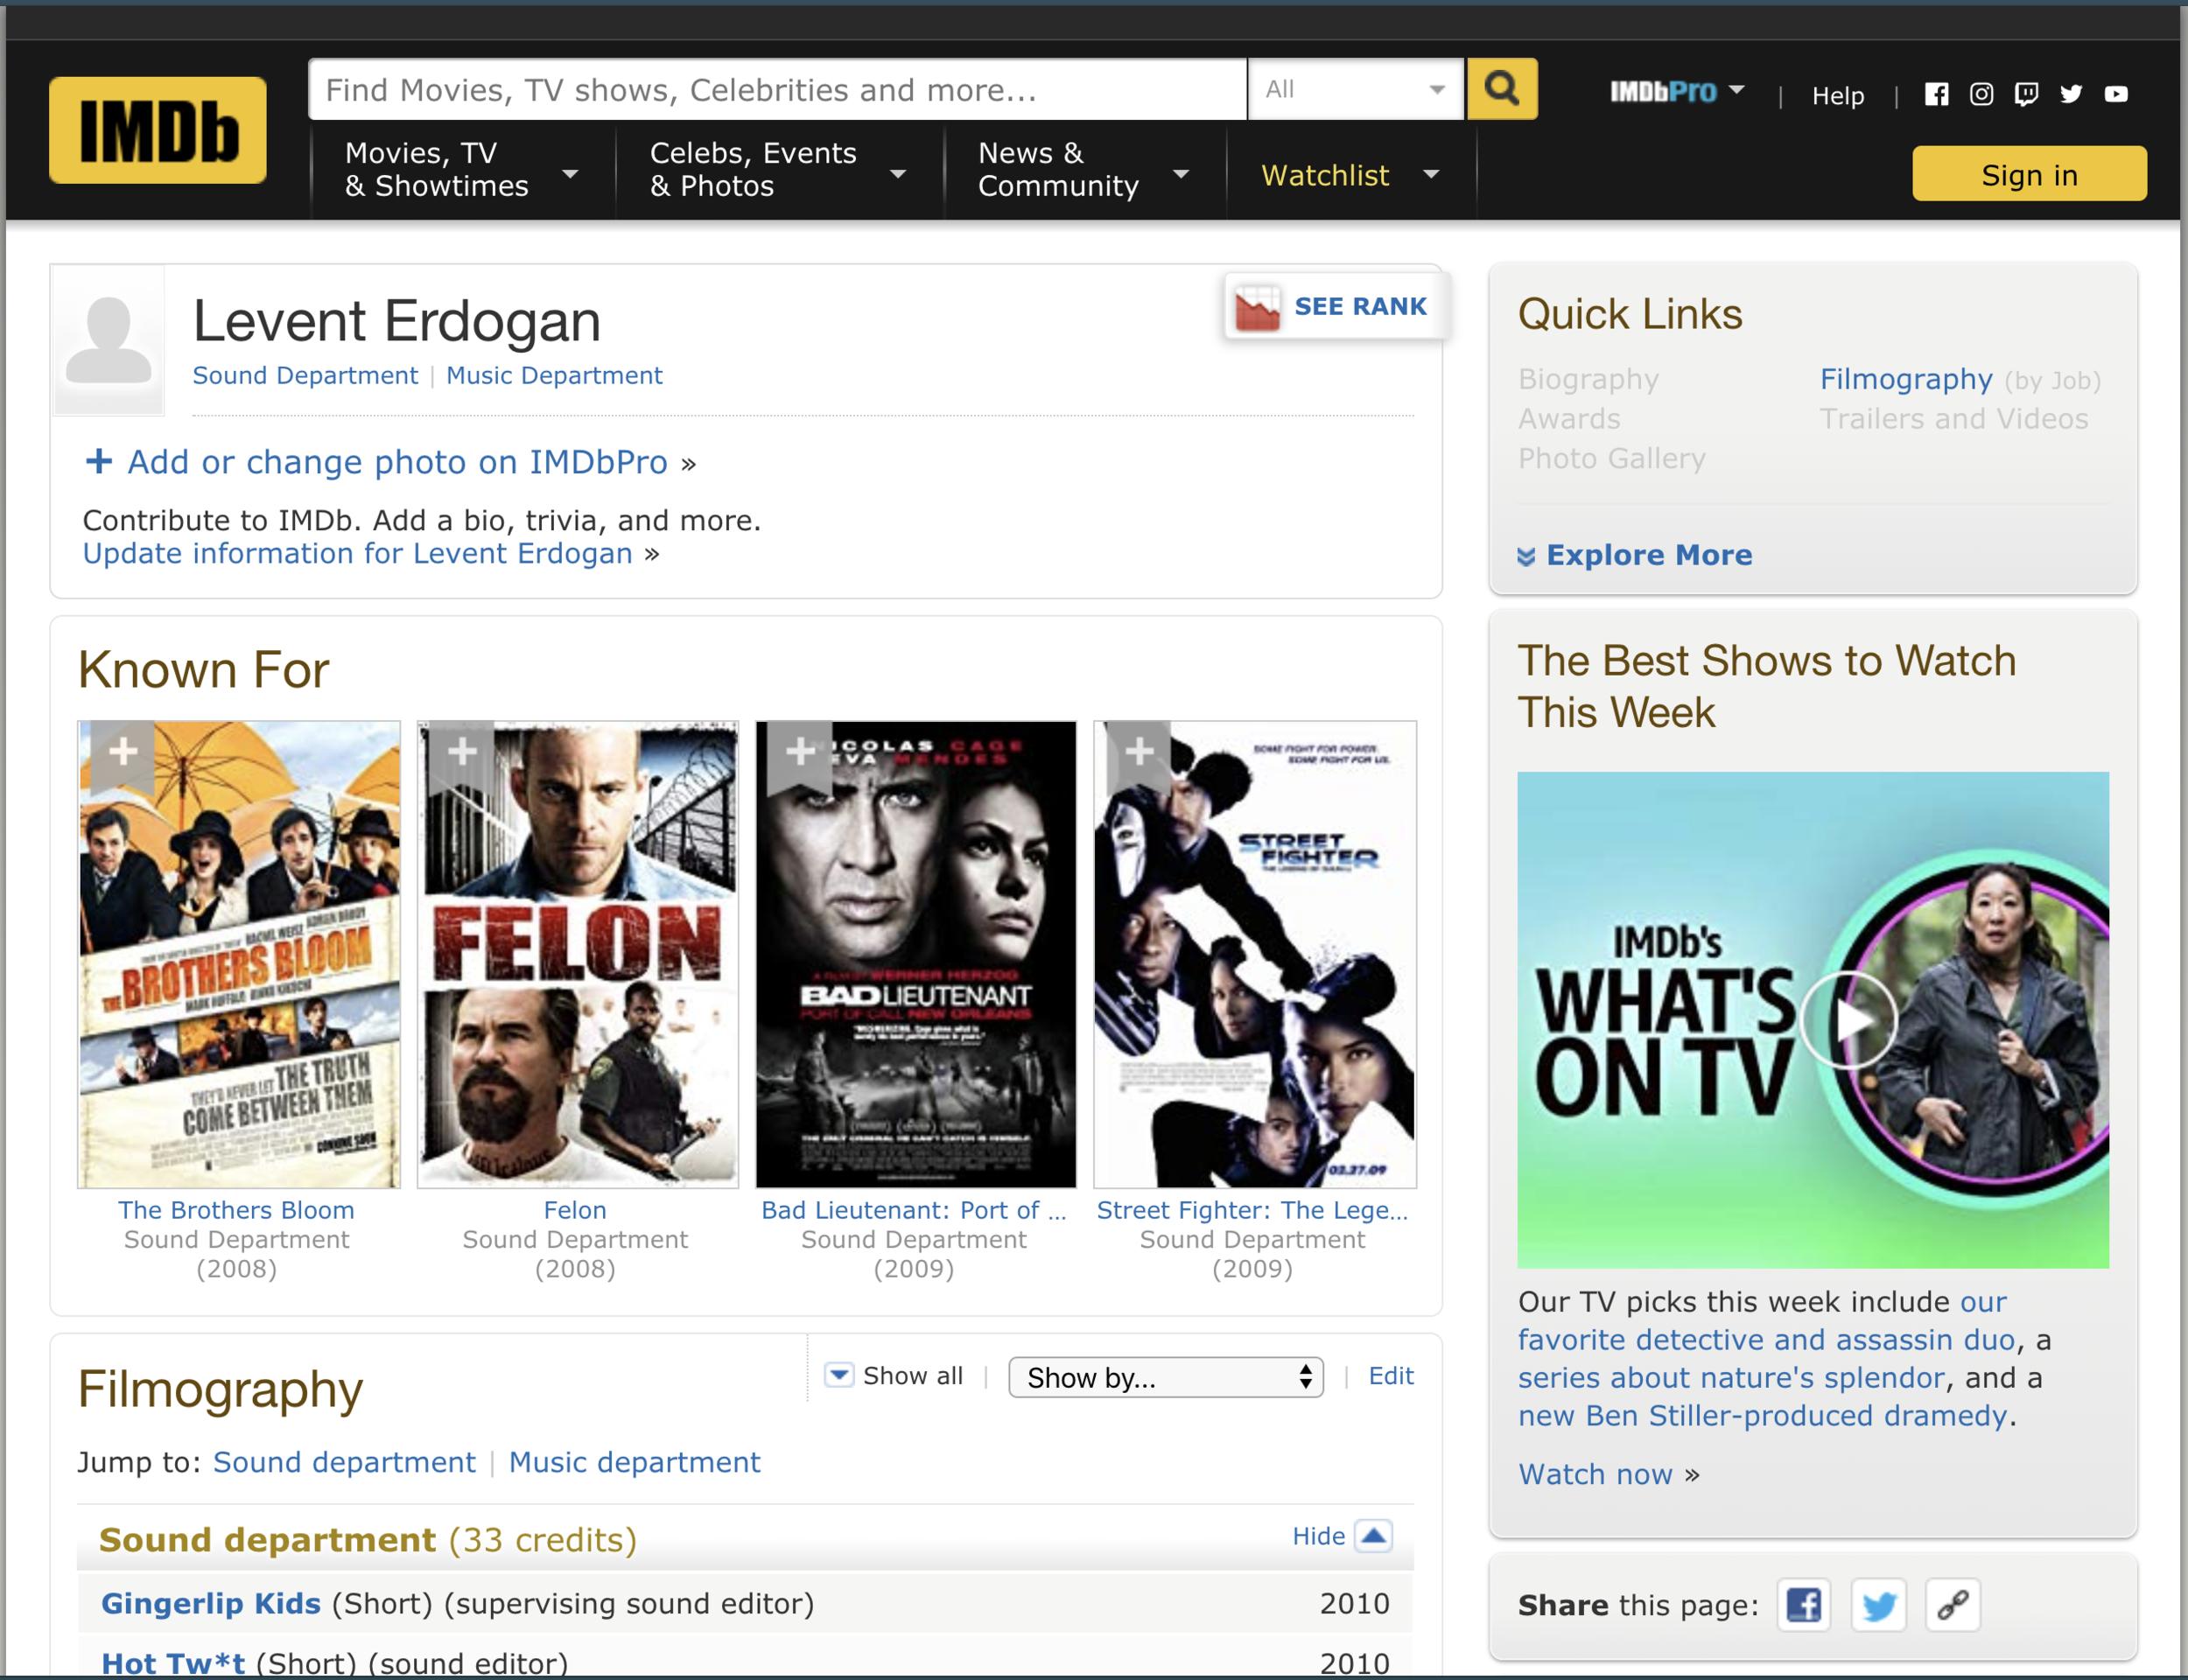 Click image to be taken to IMDB profile.